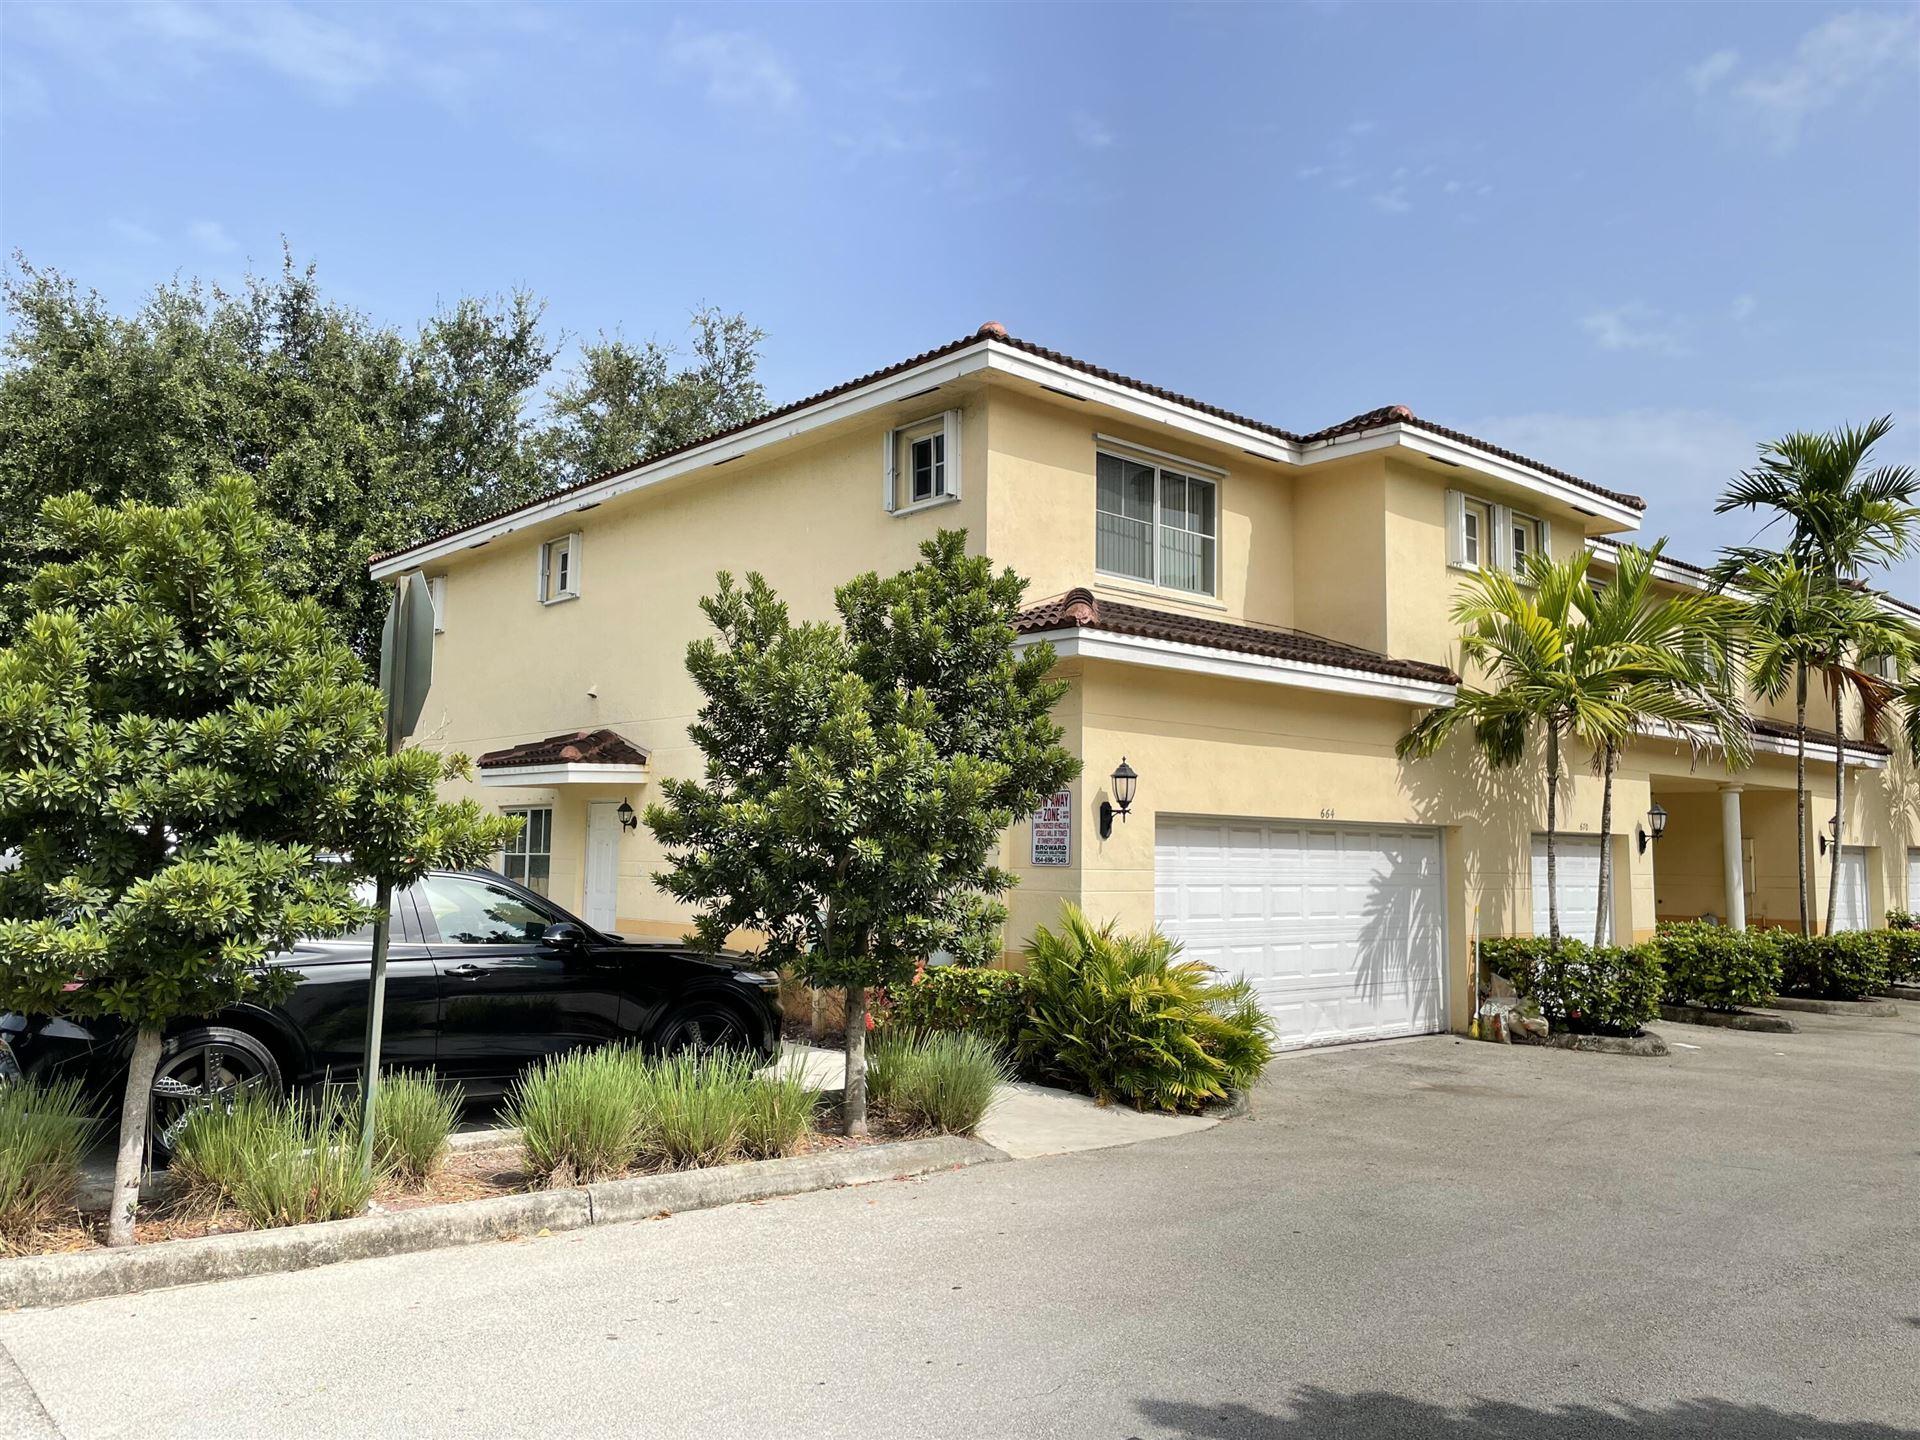 664 SW 6th Court, Pompano Beach, FL 33060 - MLS#: RX-10740480